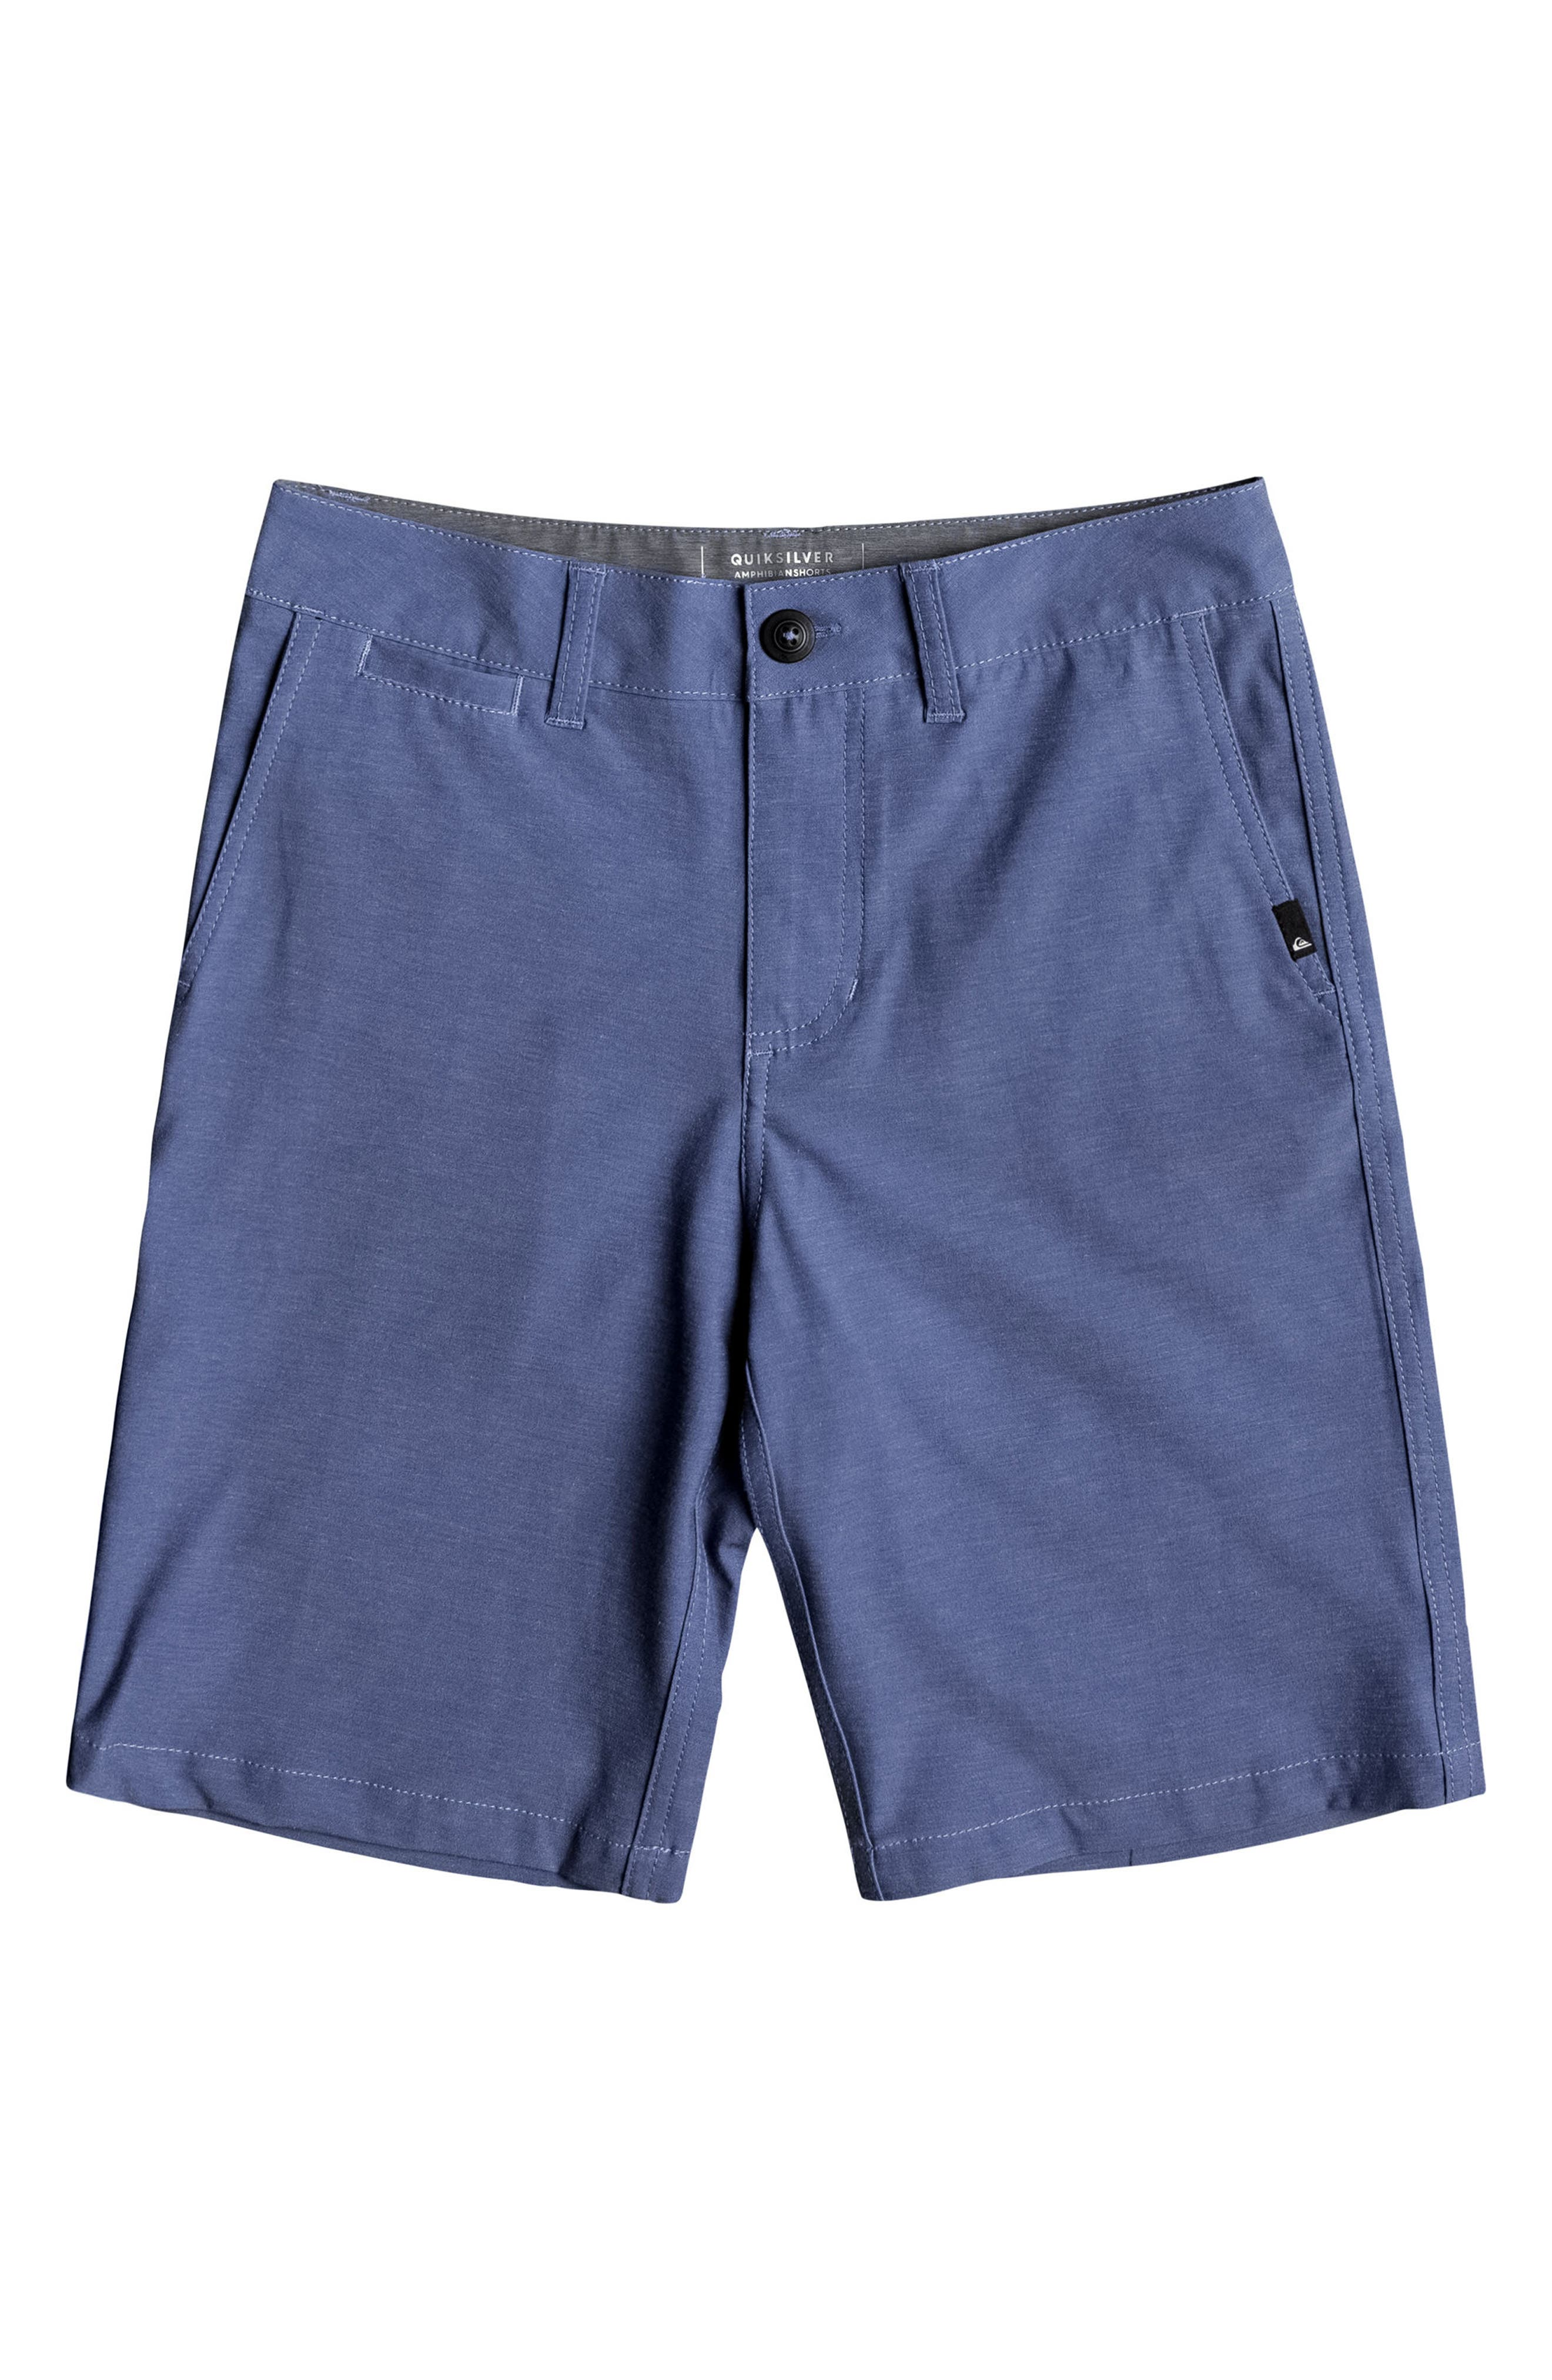 Amphibian Hybrid Shorts,                             Main thumbnail 1, color,                             417